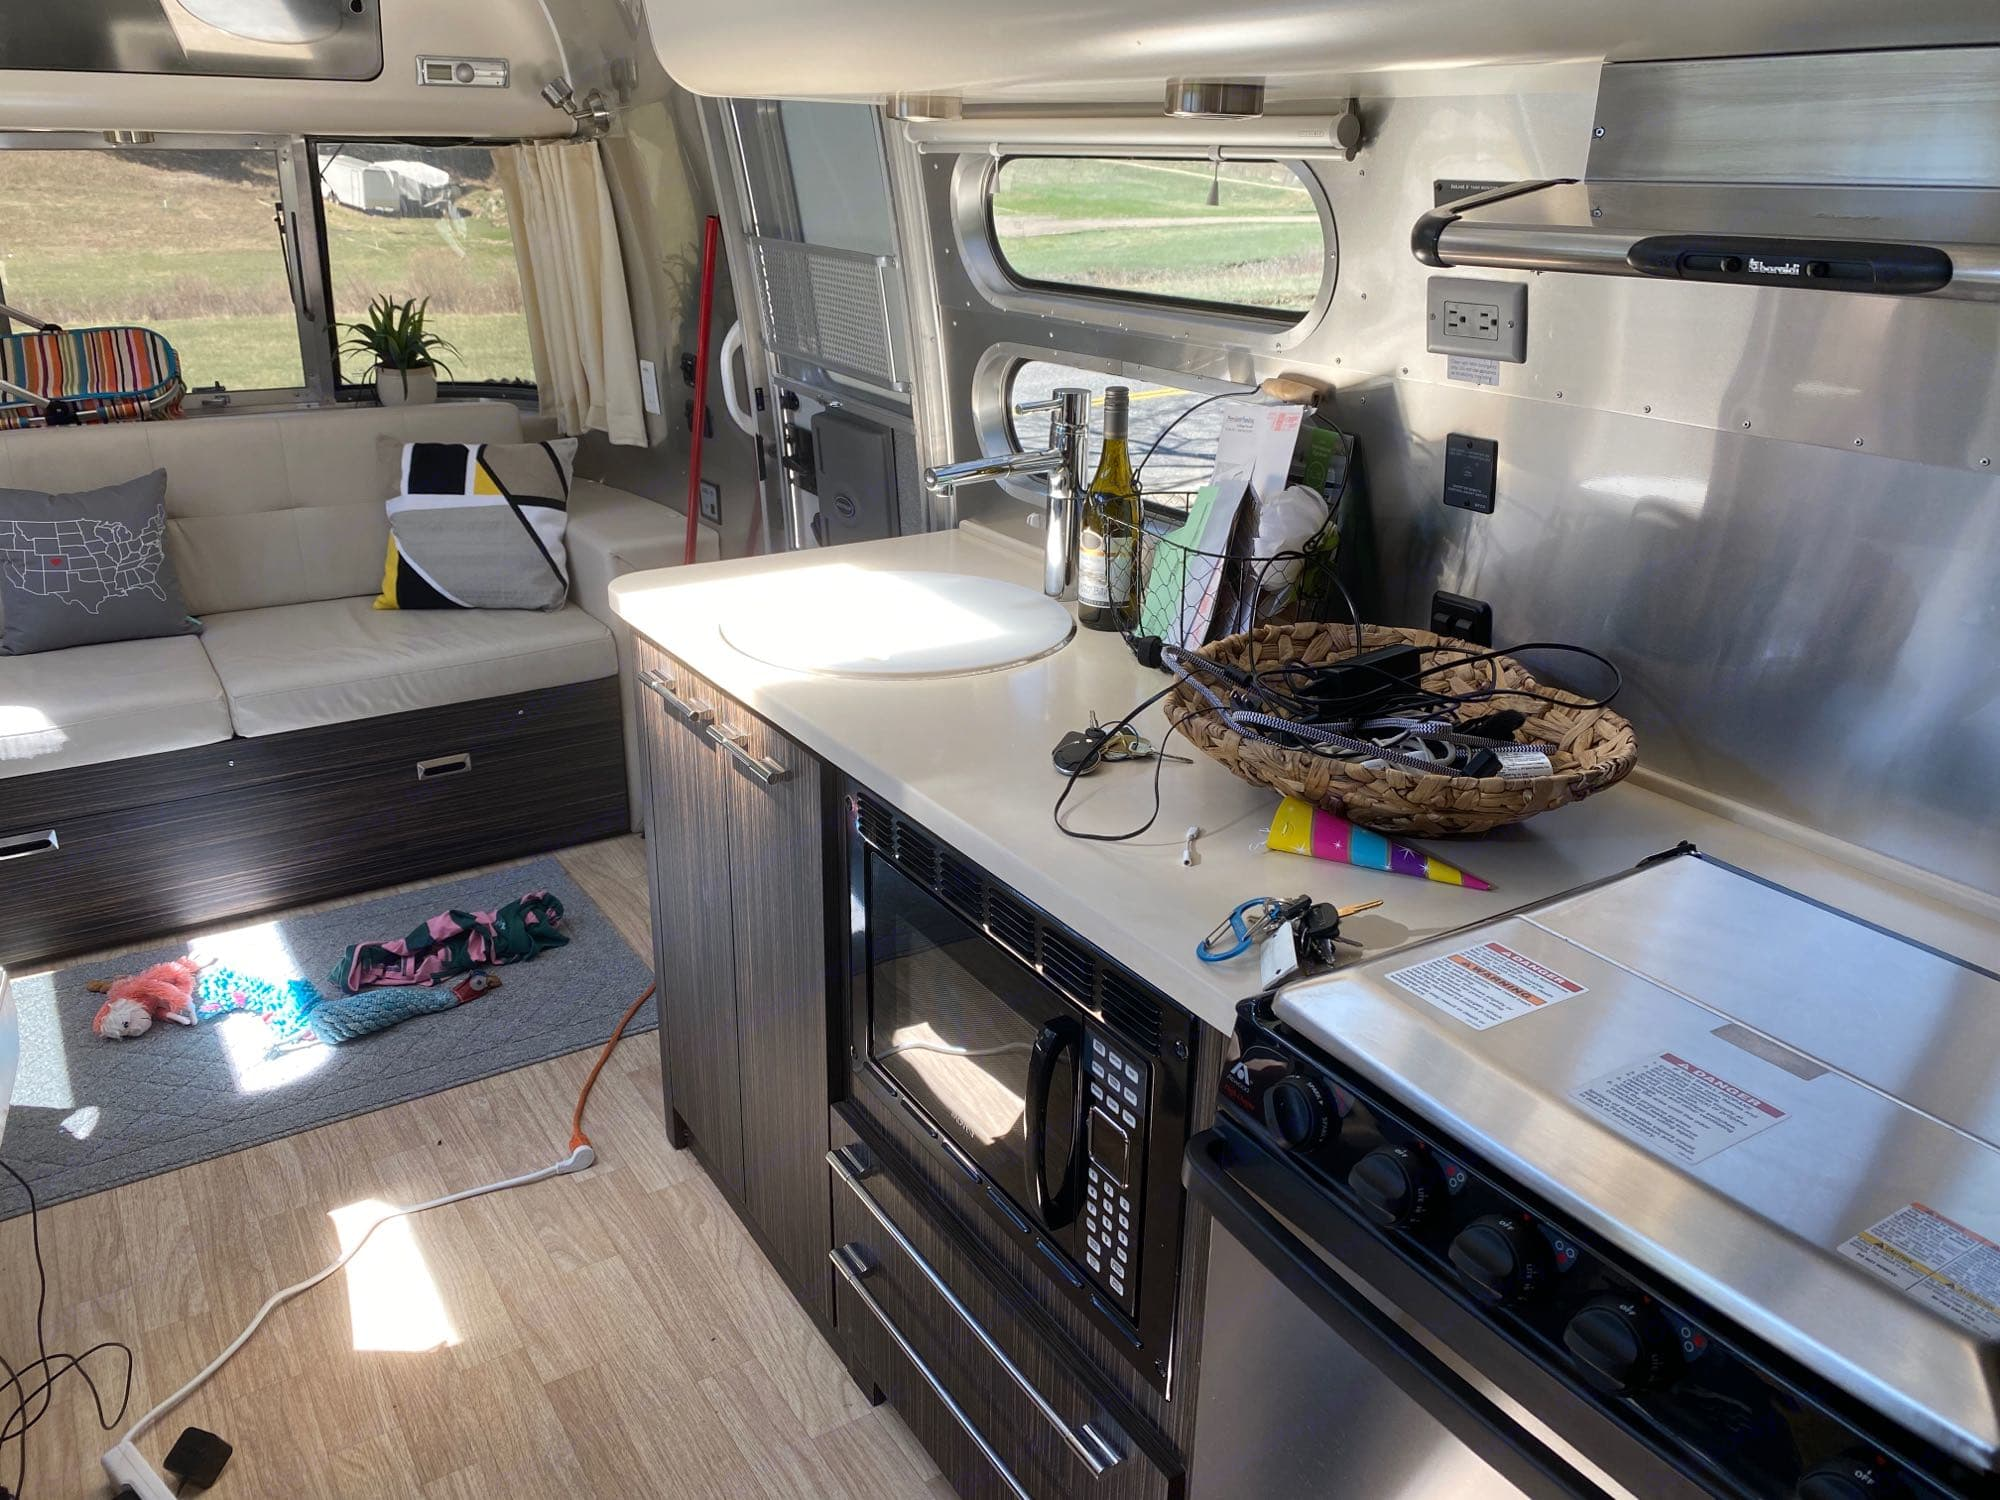 Vacation ready kitchen!. Airstream International 2015